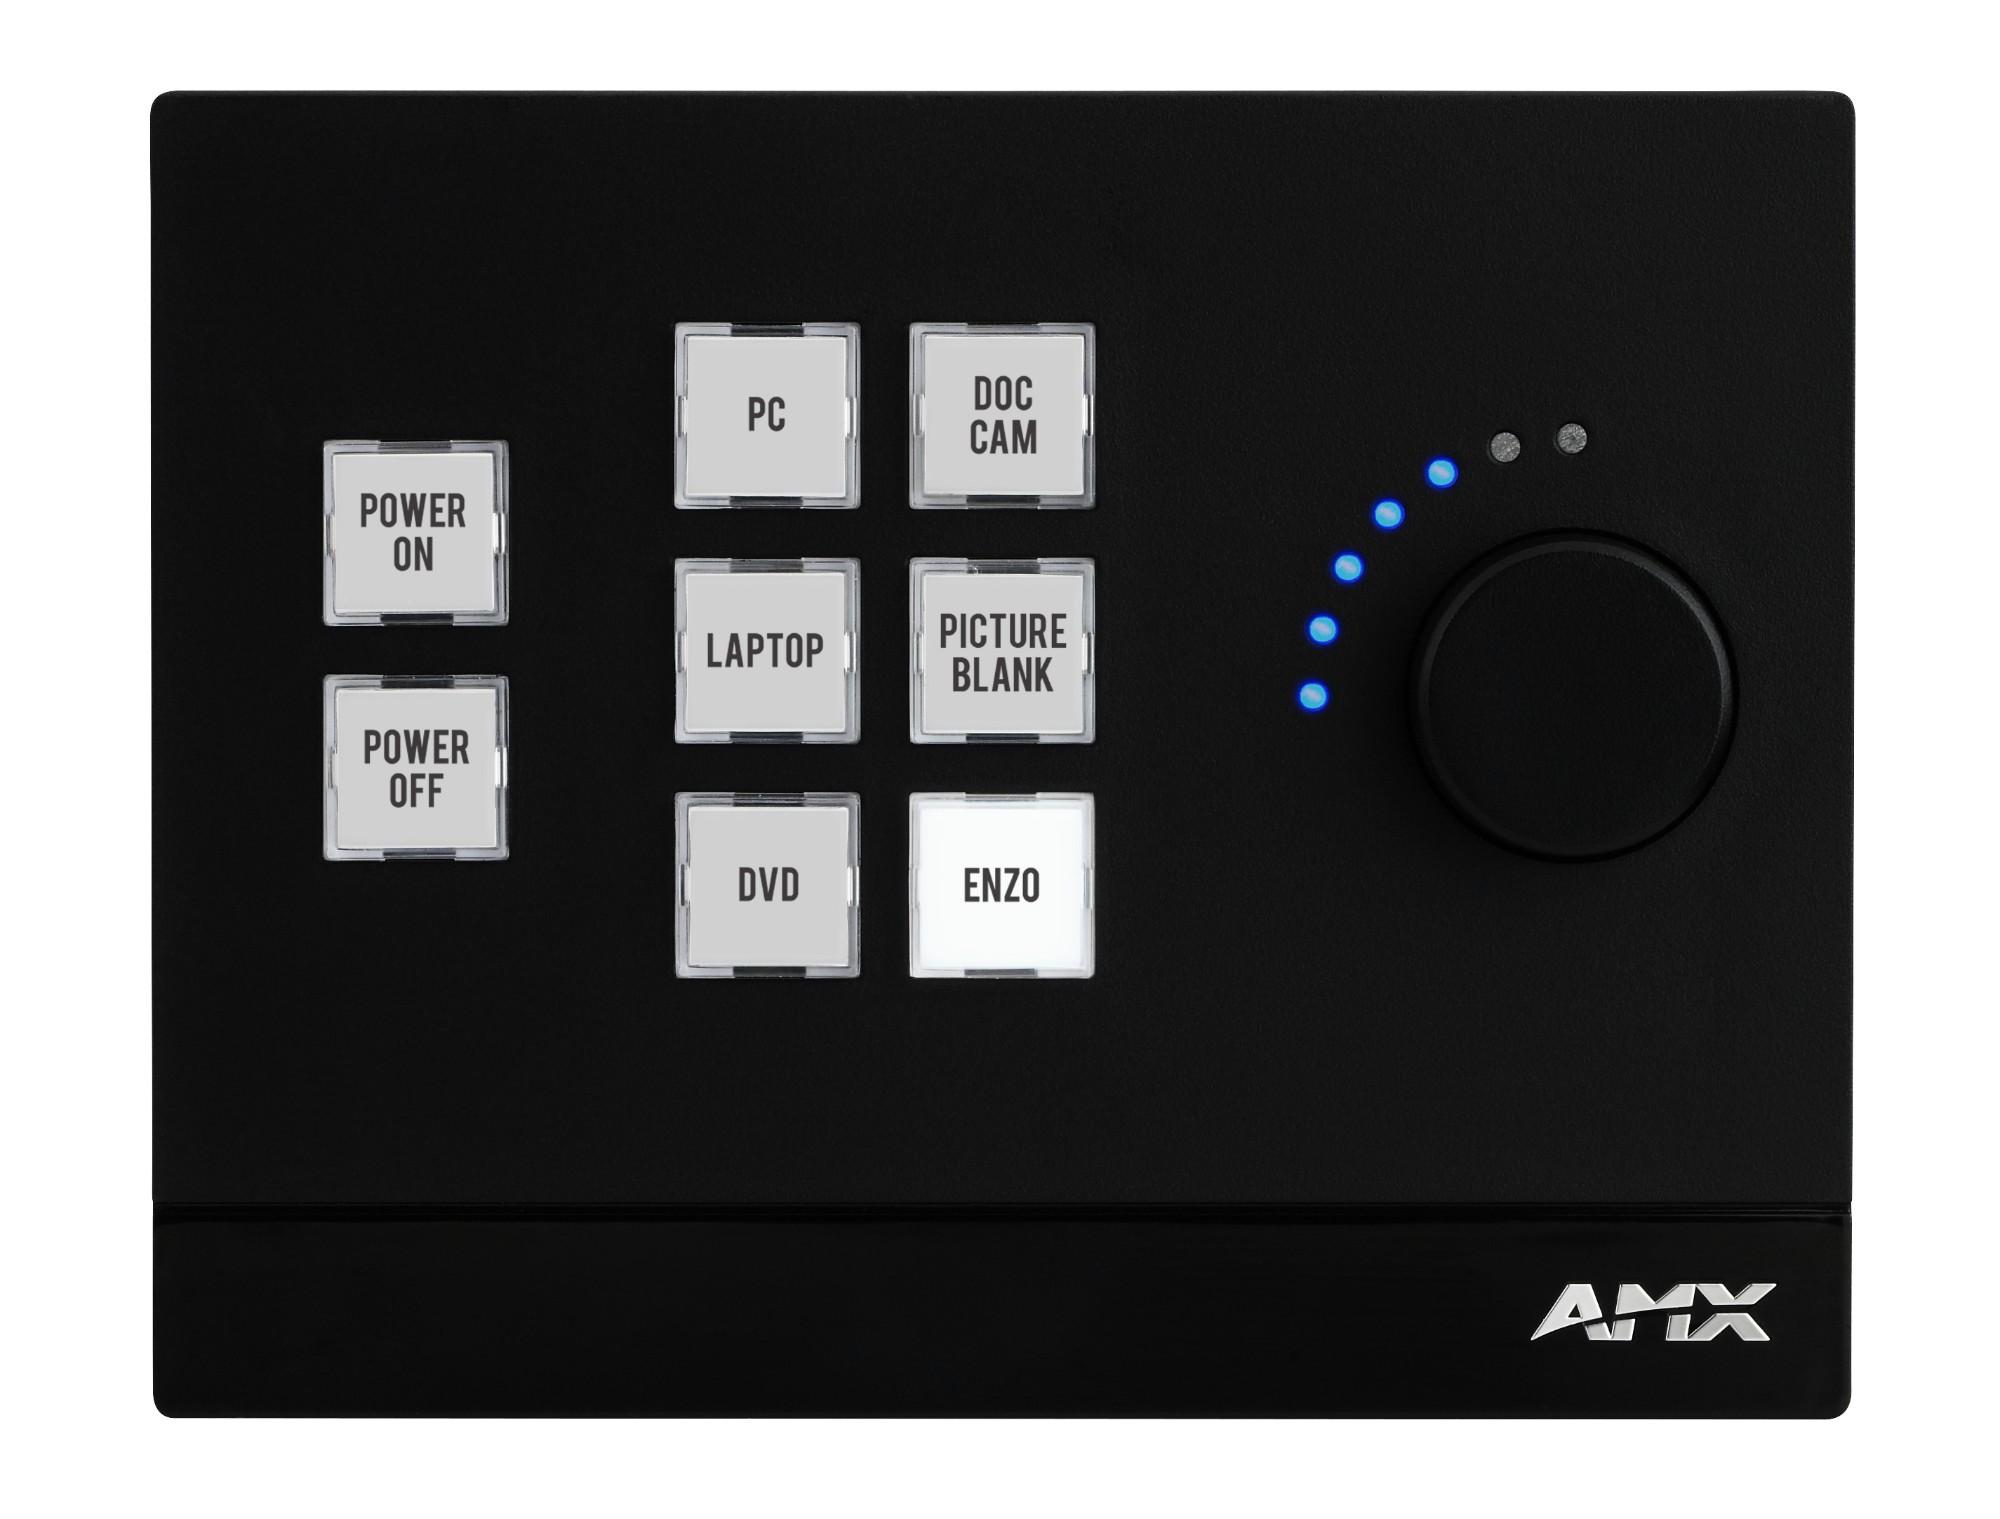 AMX Massio Black push-button panel